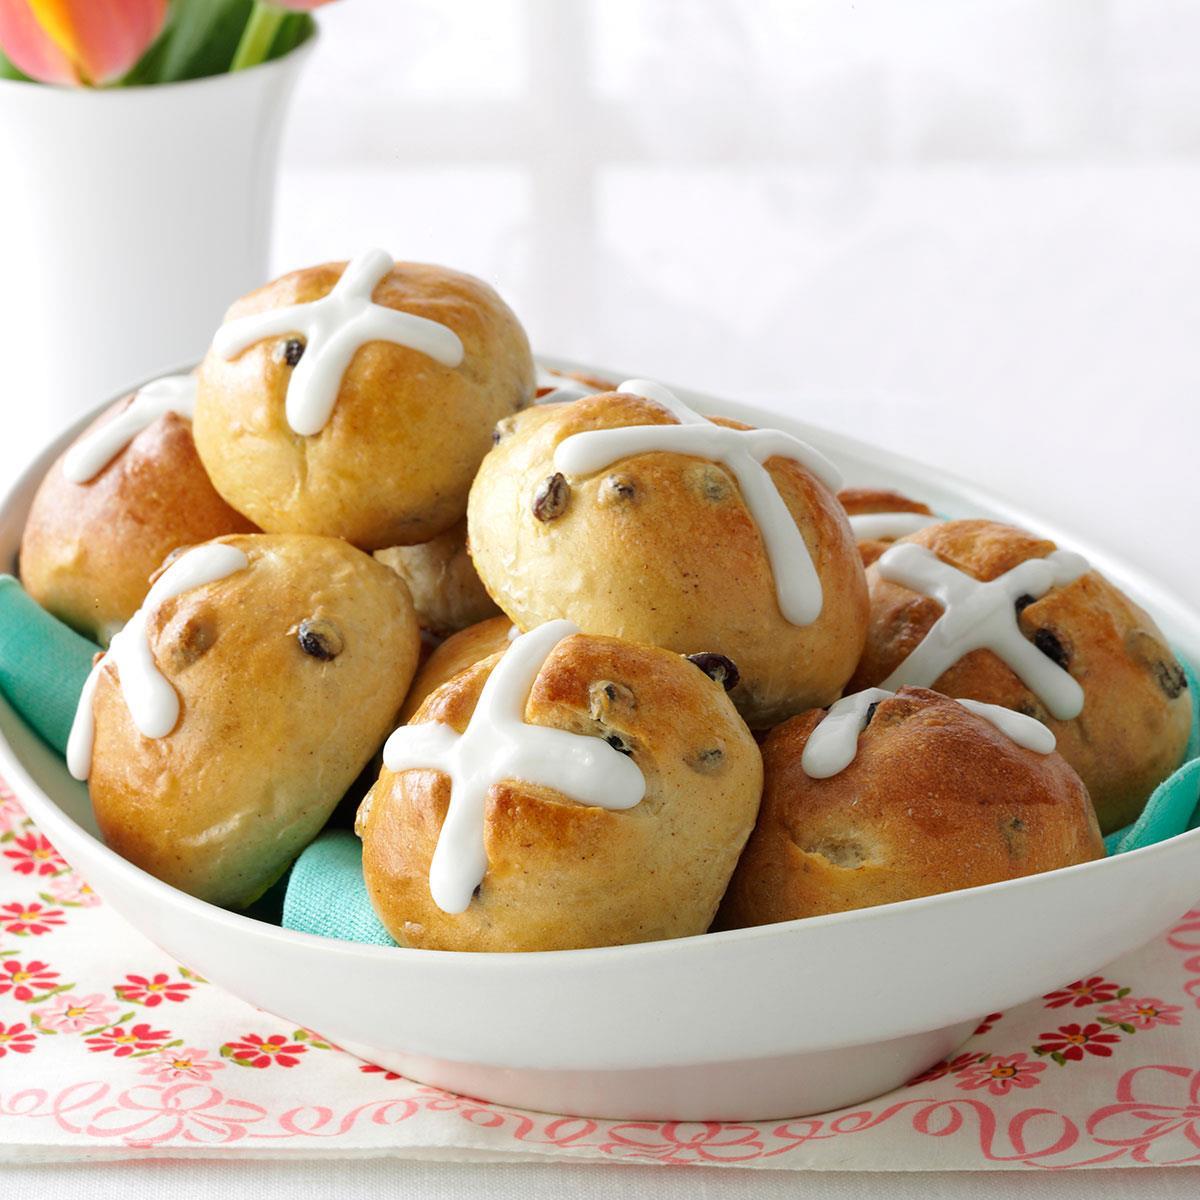 Traditional Hot Cross Buns image